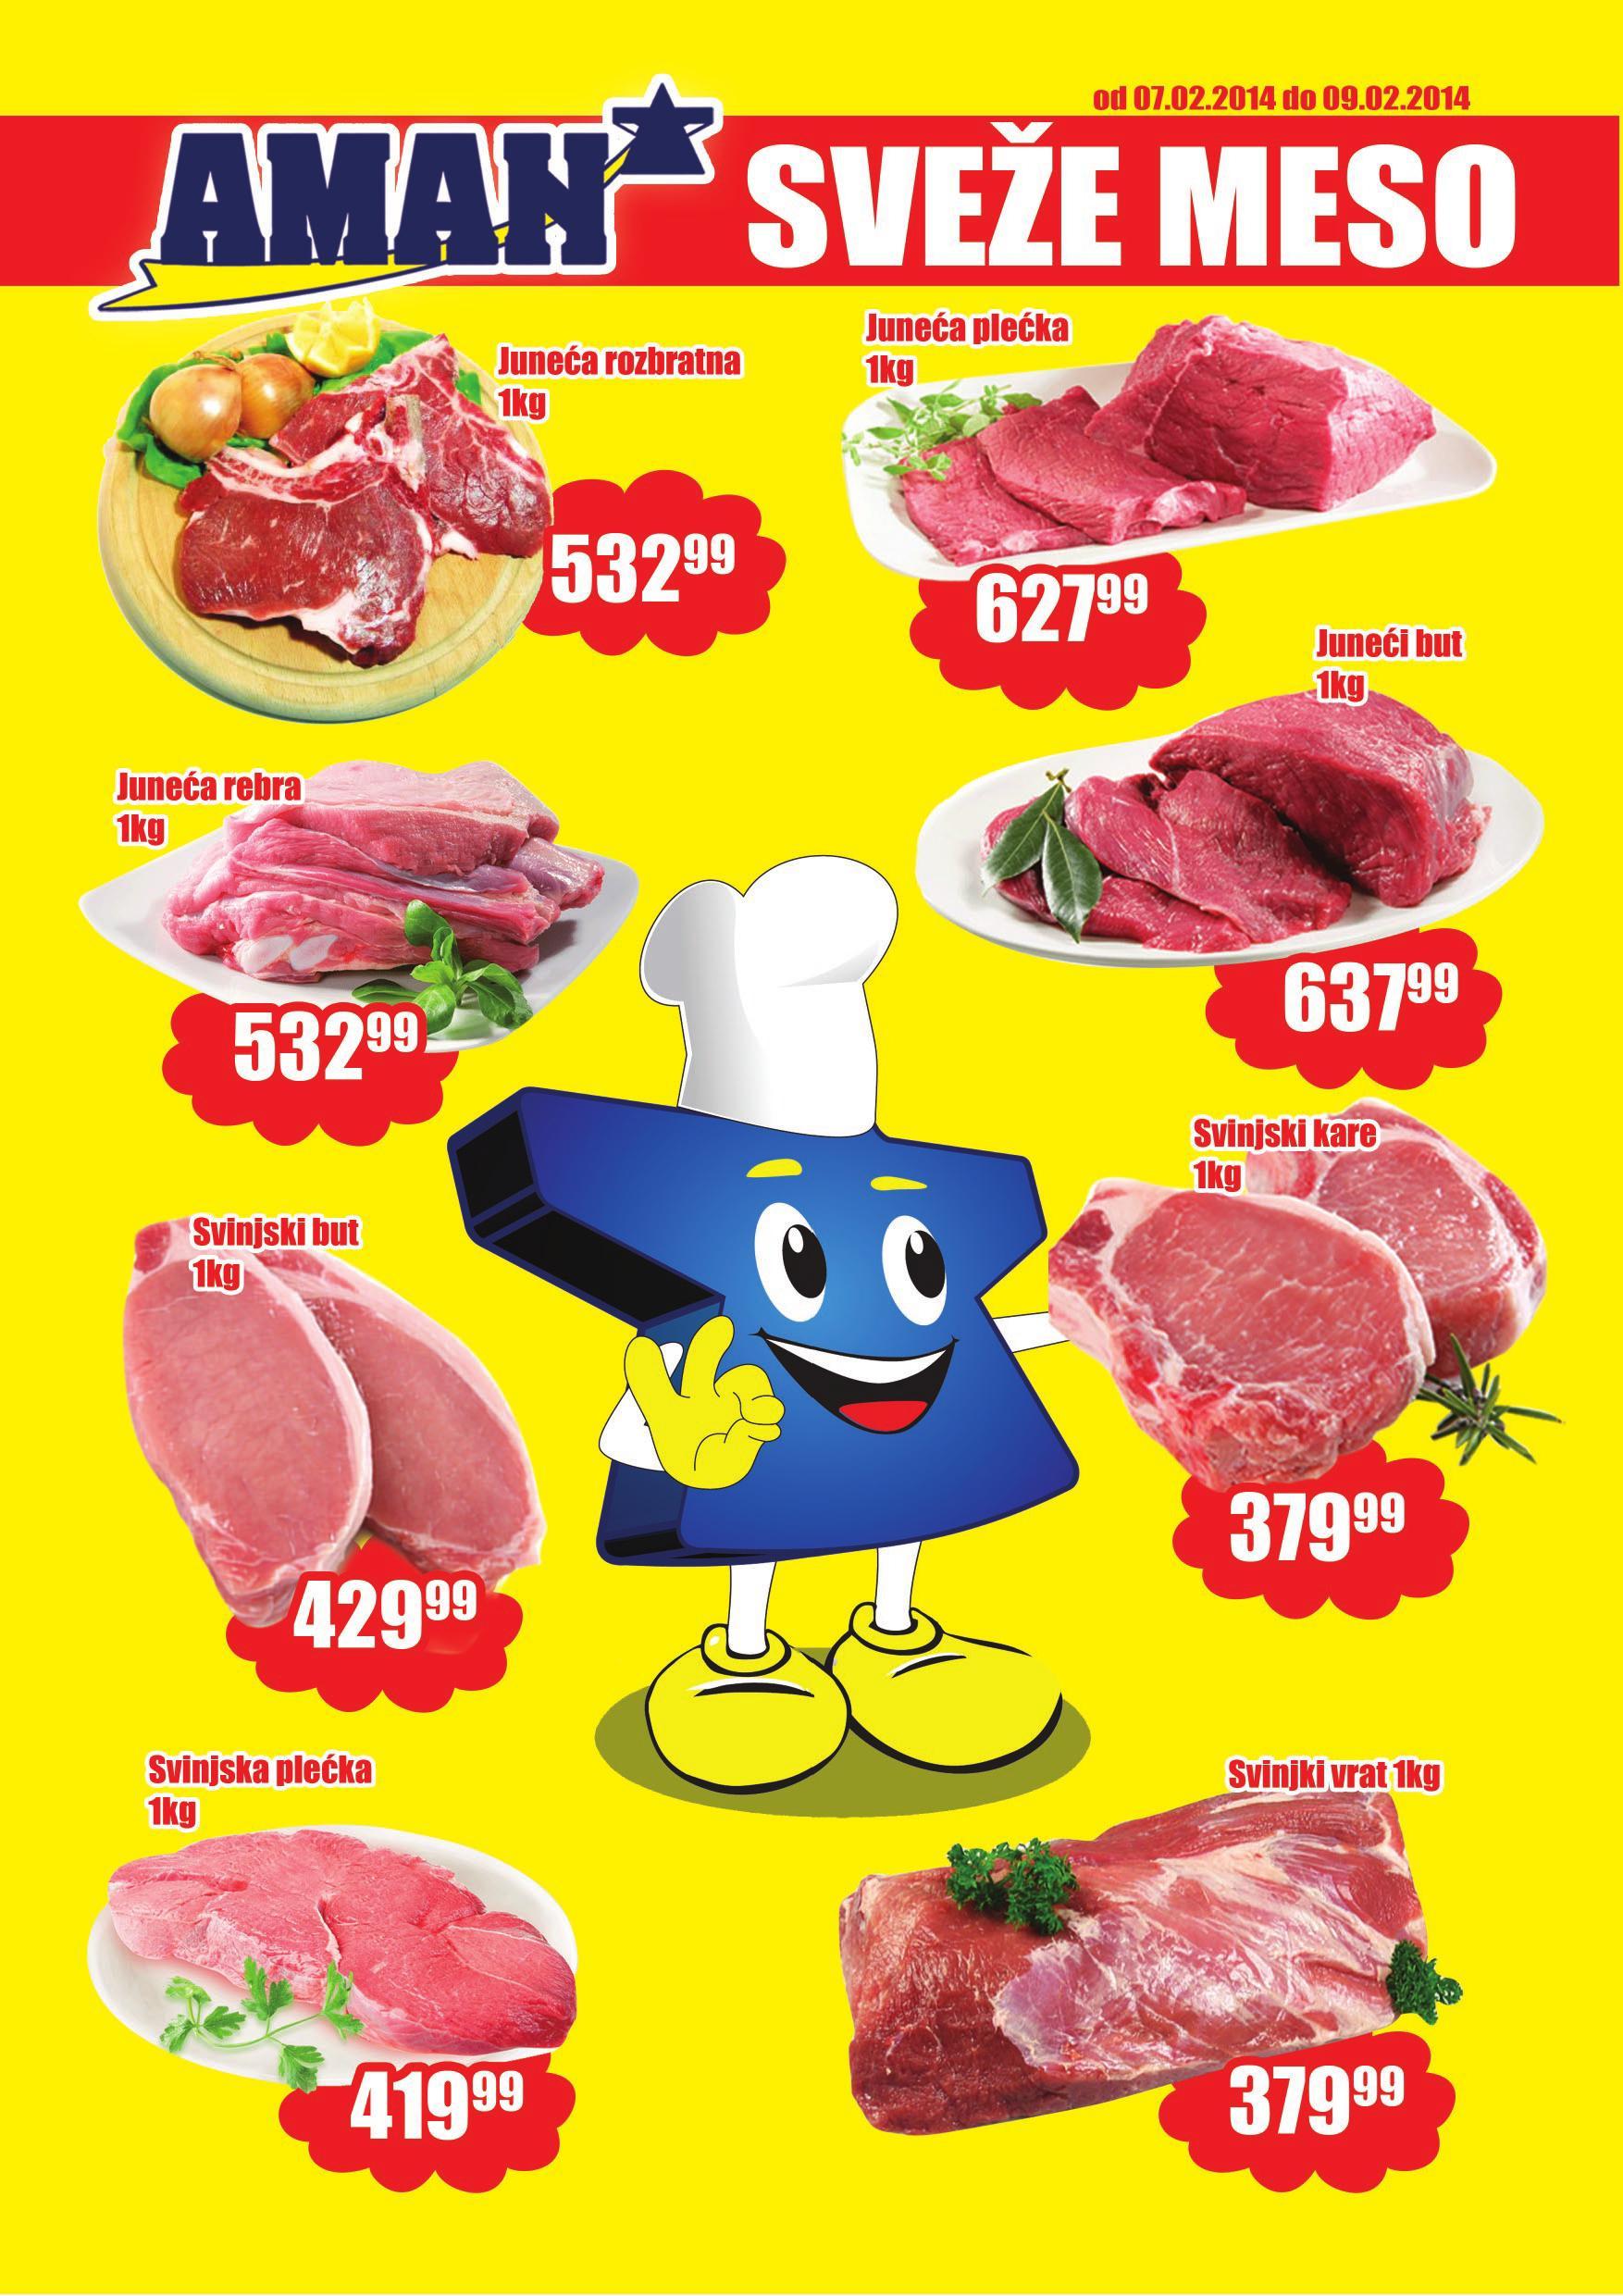 Aman katalog vikend ponuda svežeg mesa